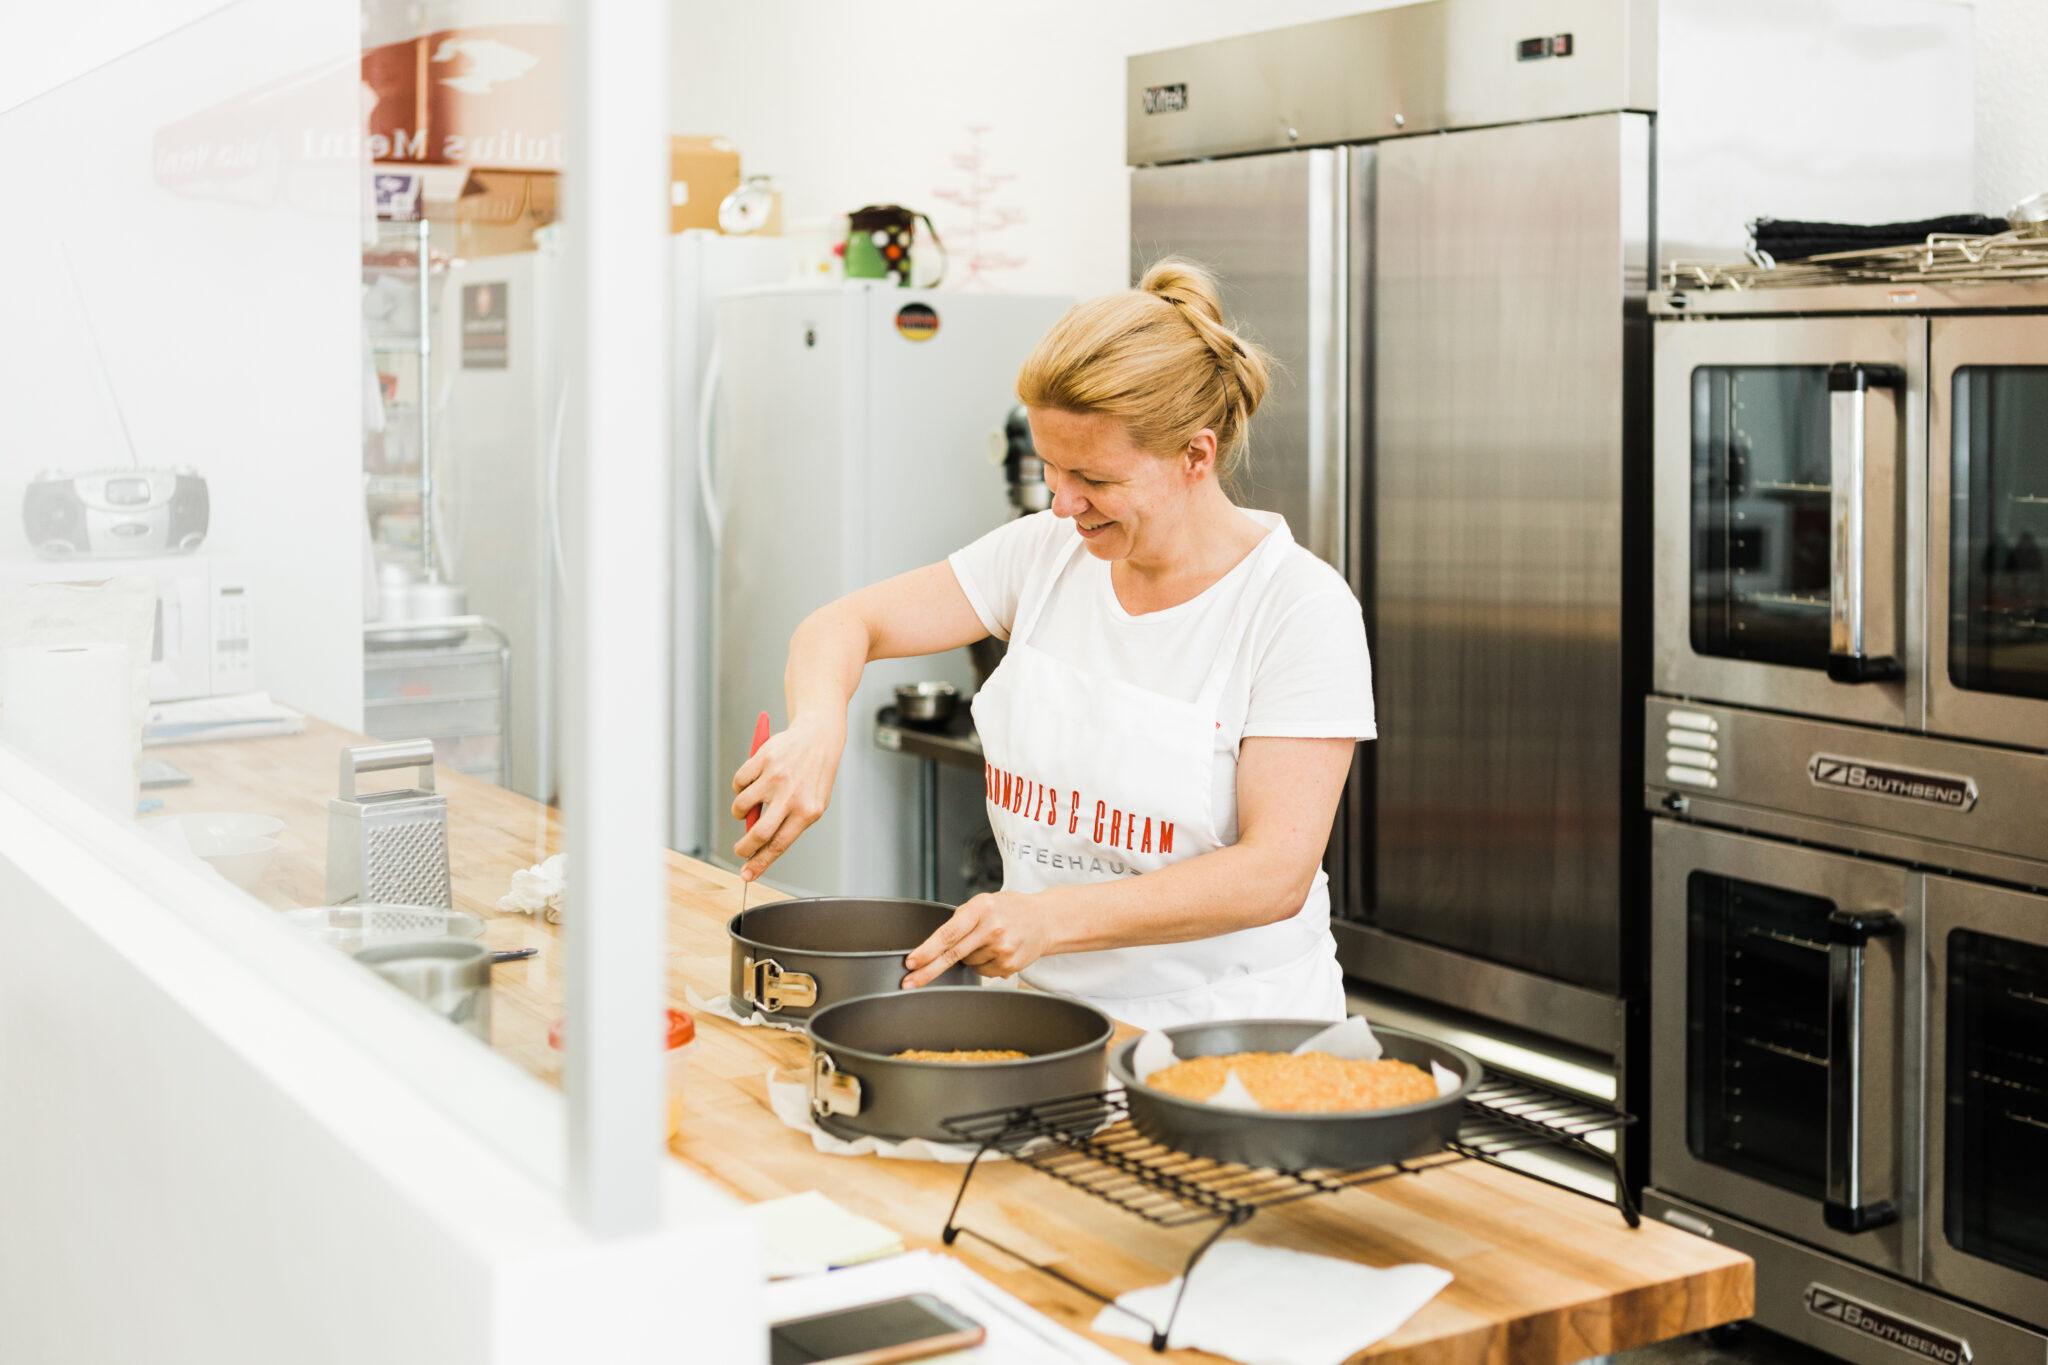 Grit Rambusch baking at Crumbles and Cream